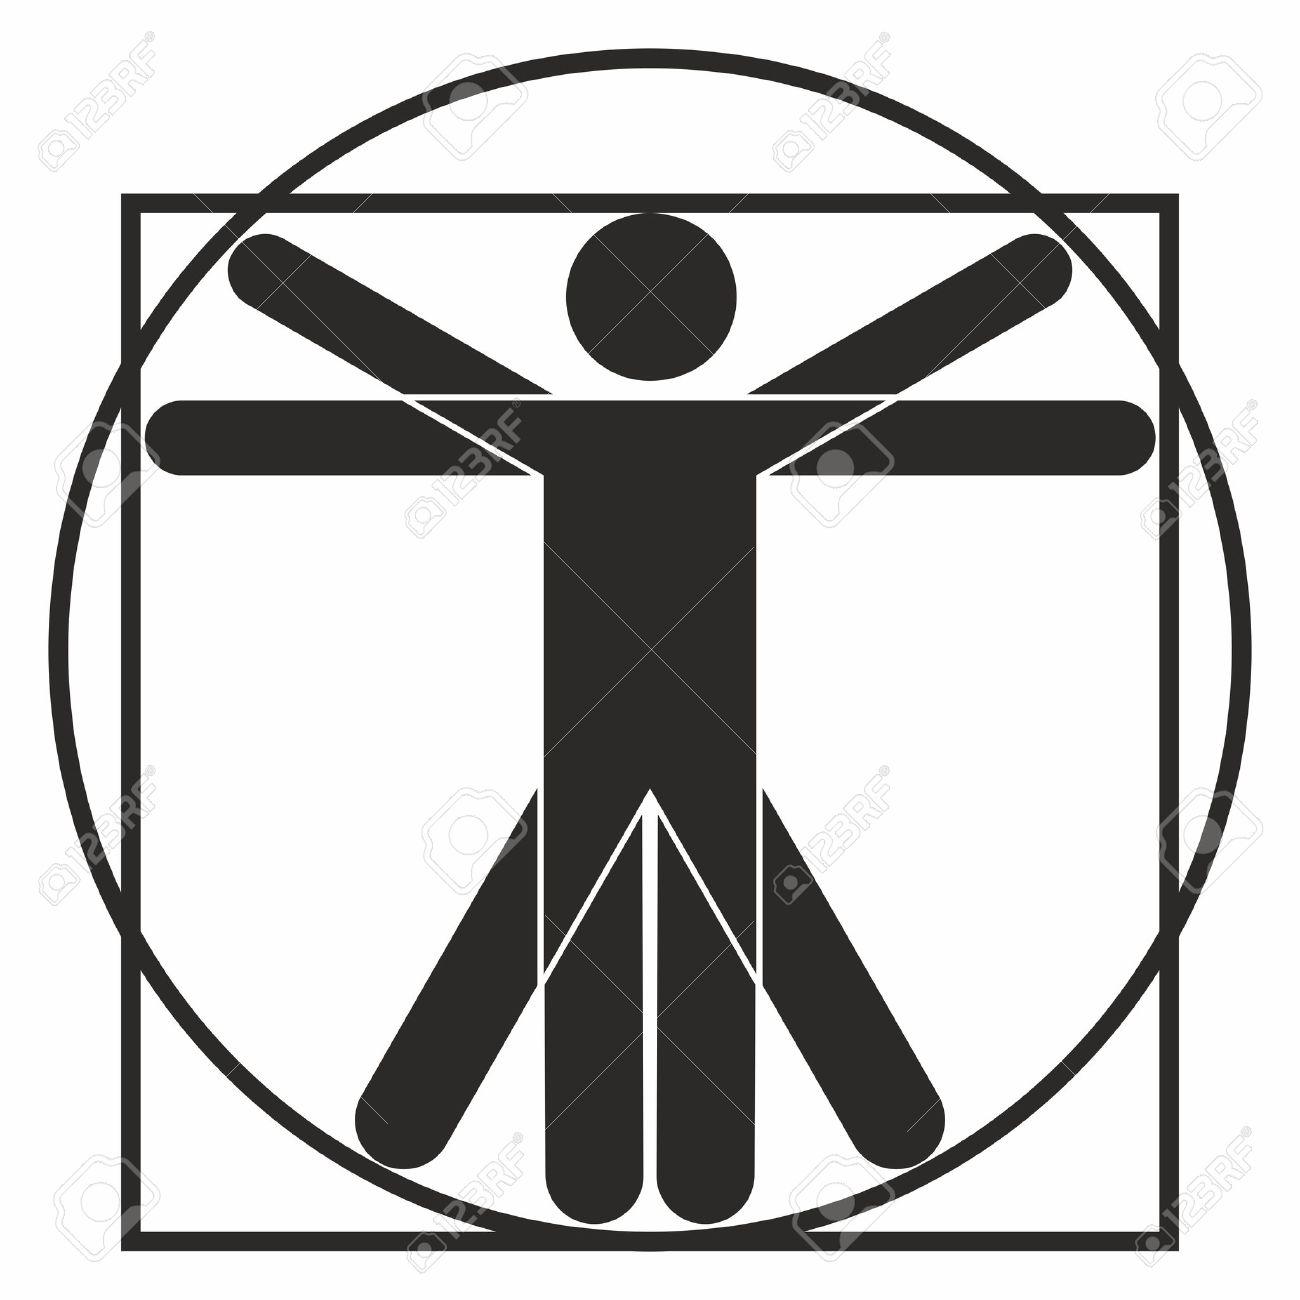 vitruvian man icon royalty free cliparts vectors and stock rh 123rf com vitruvian man vector download vitruvian man vector art